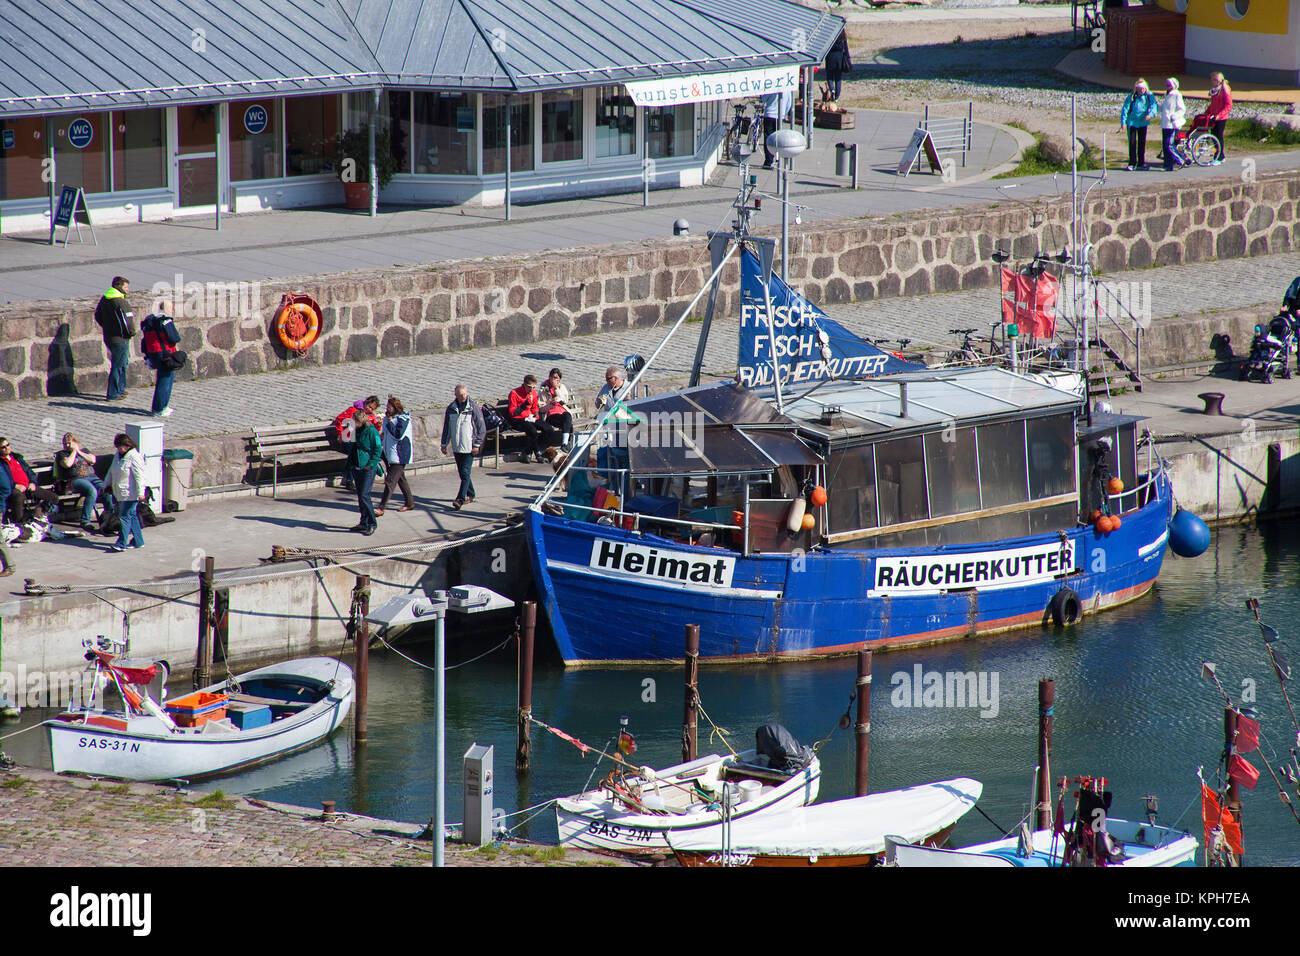 Smoking fish cutter at harbour of Sassnitz, Ruegen island, Mecklenburg-Western Pomerania, Baltic Sea, Germany, Europe Stock Photo